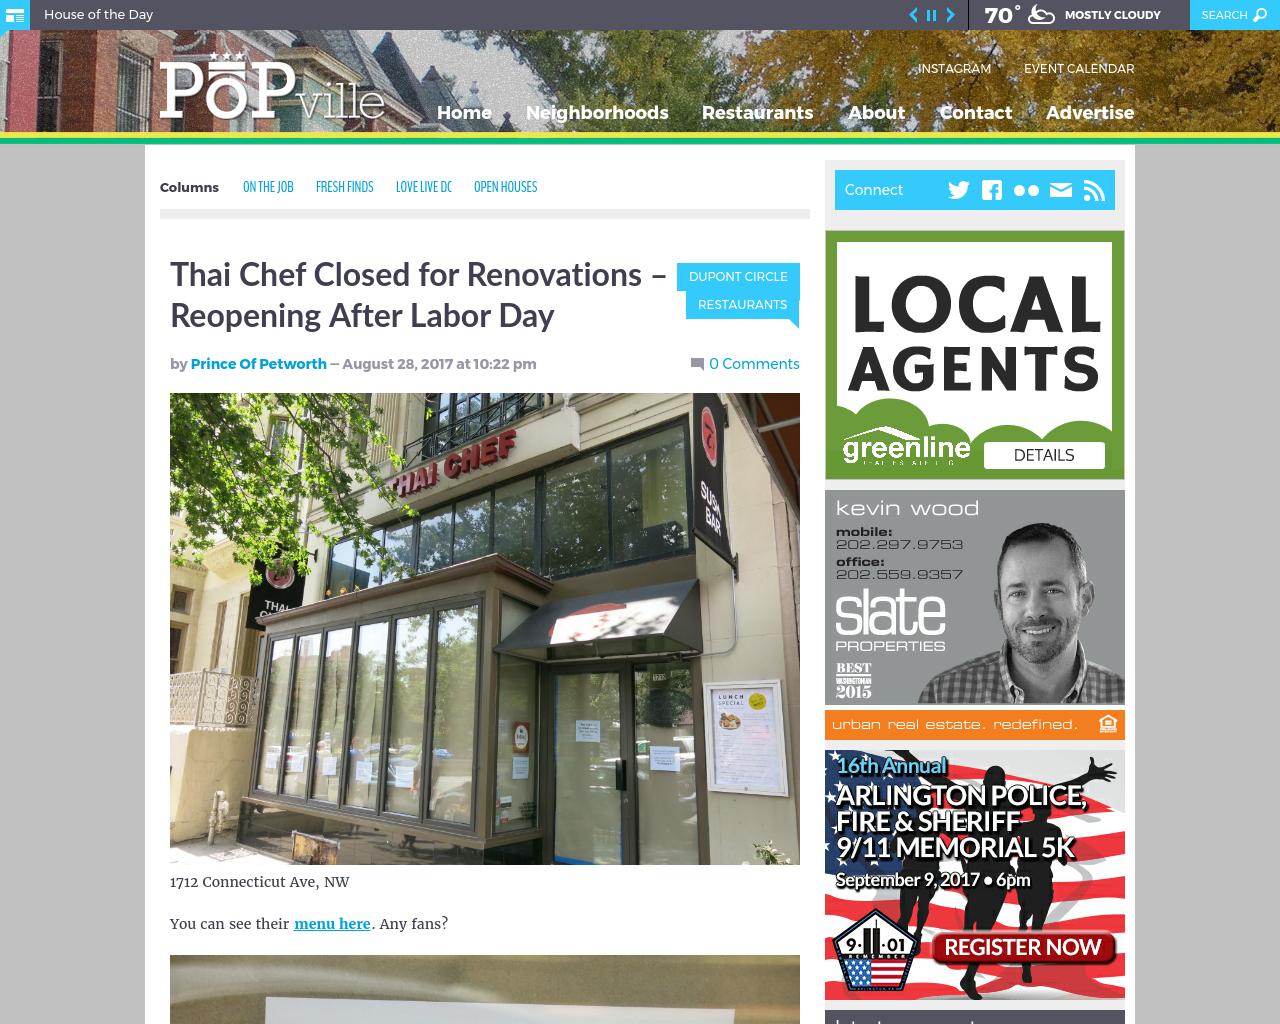 PoPville-Advertising-Reviews-Pricing